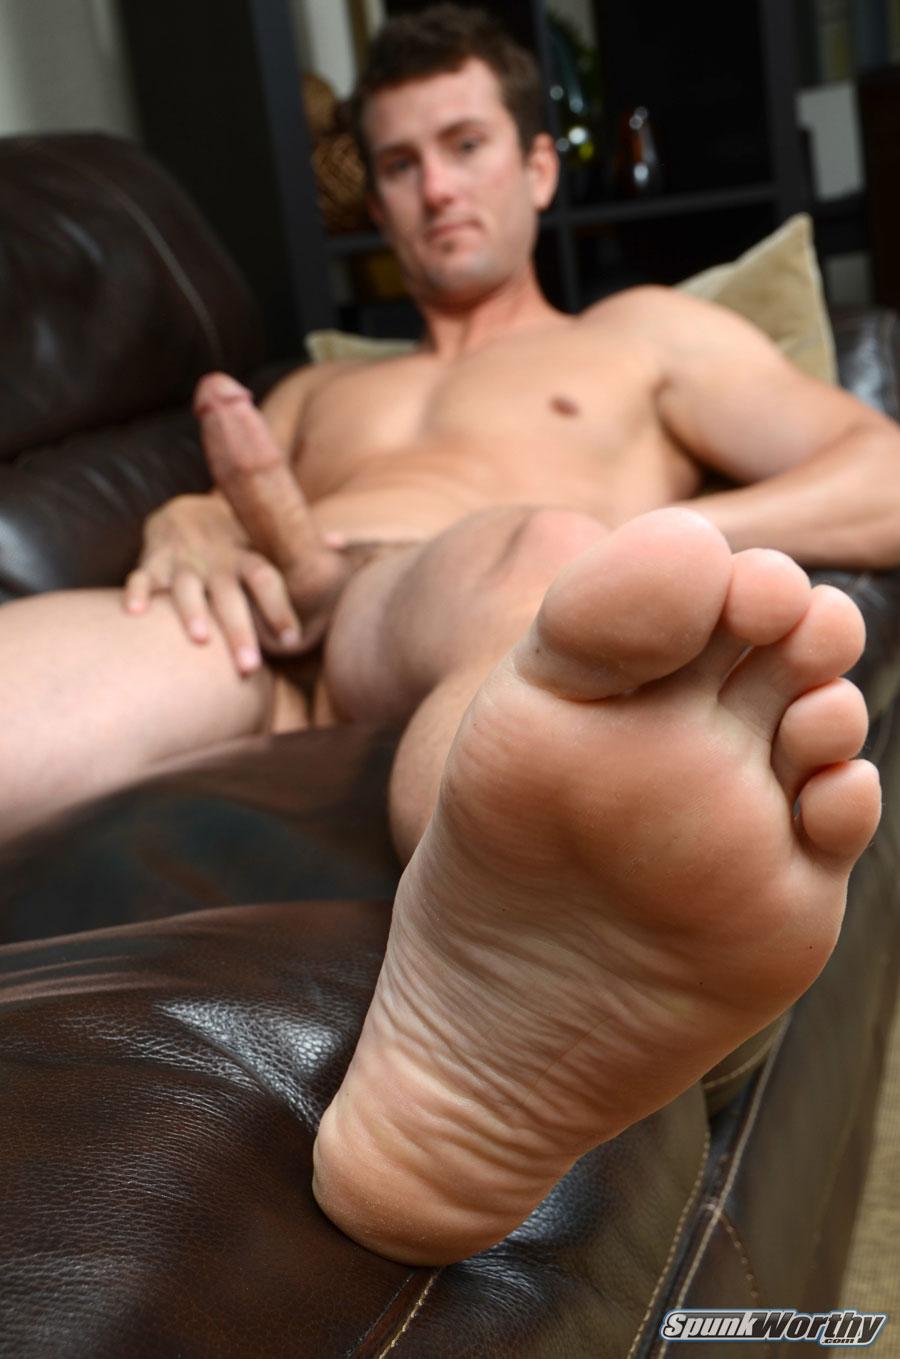 gay handjob free amateur porn videos